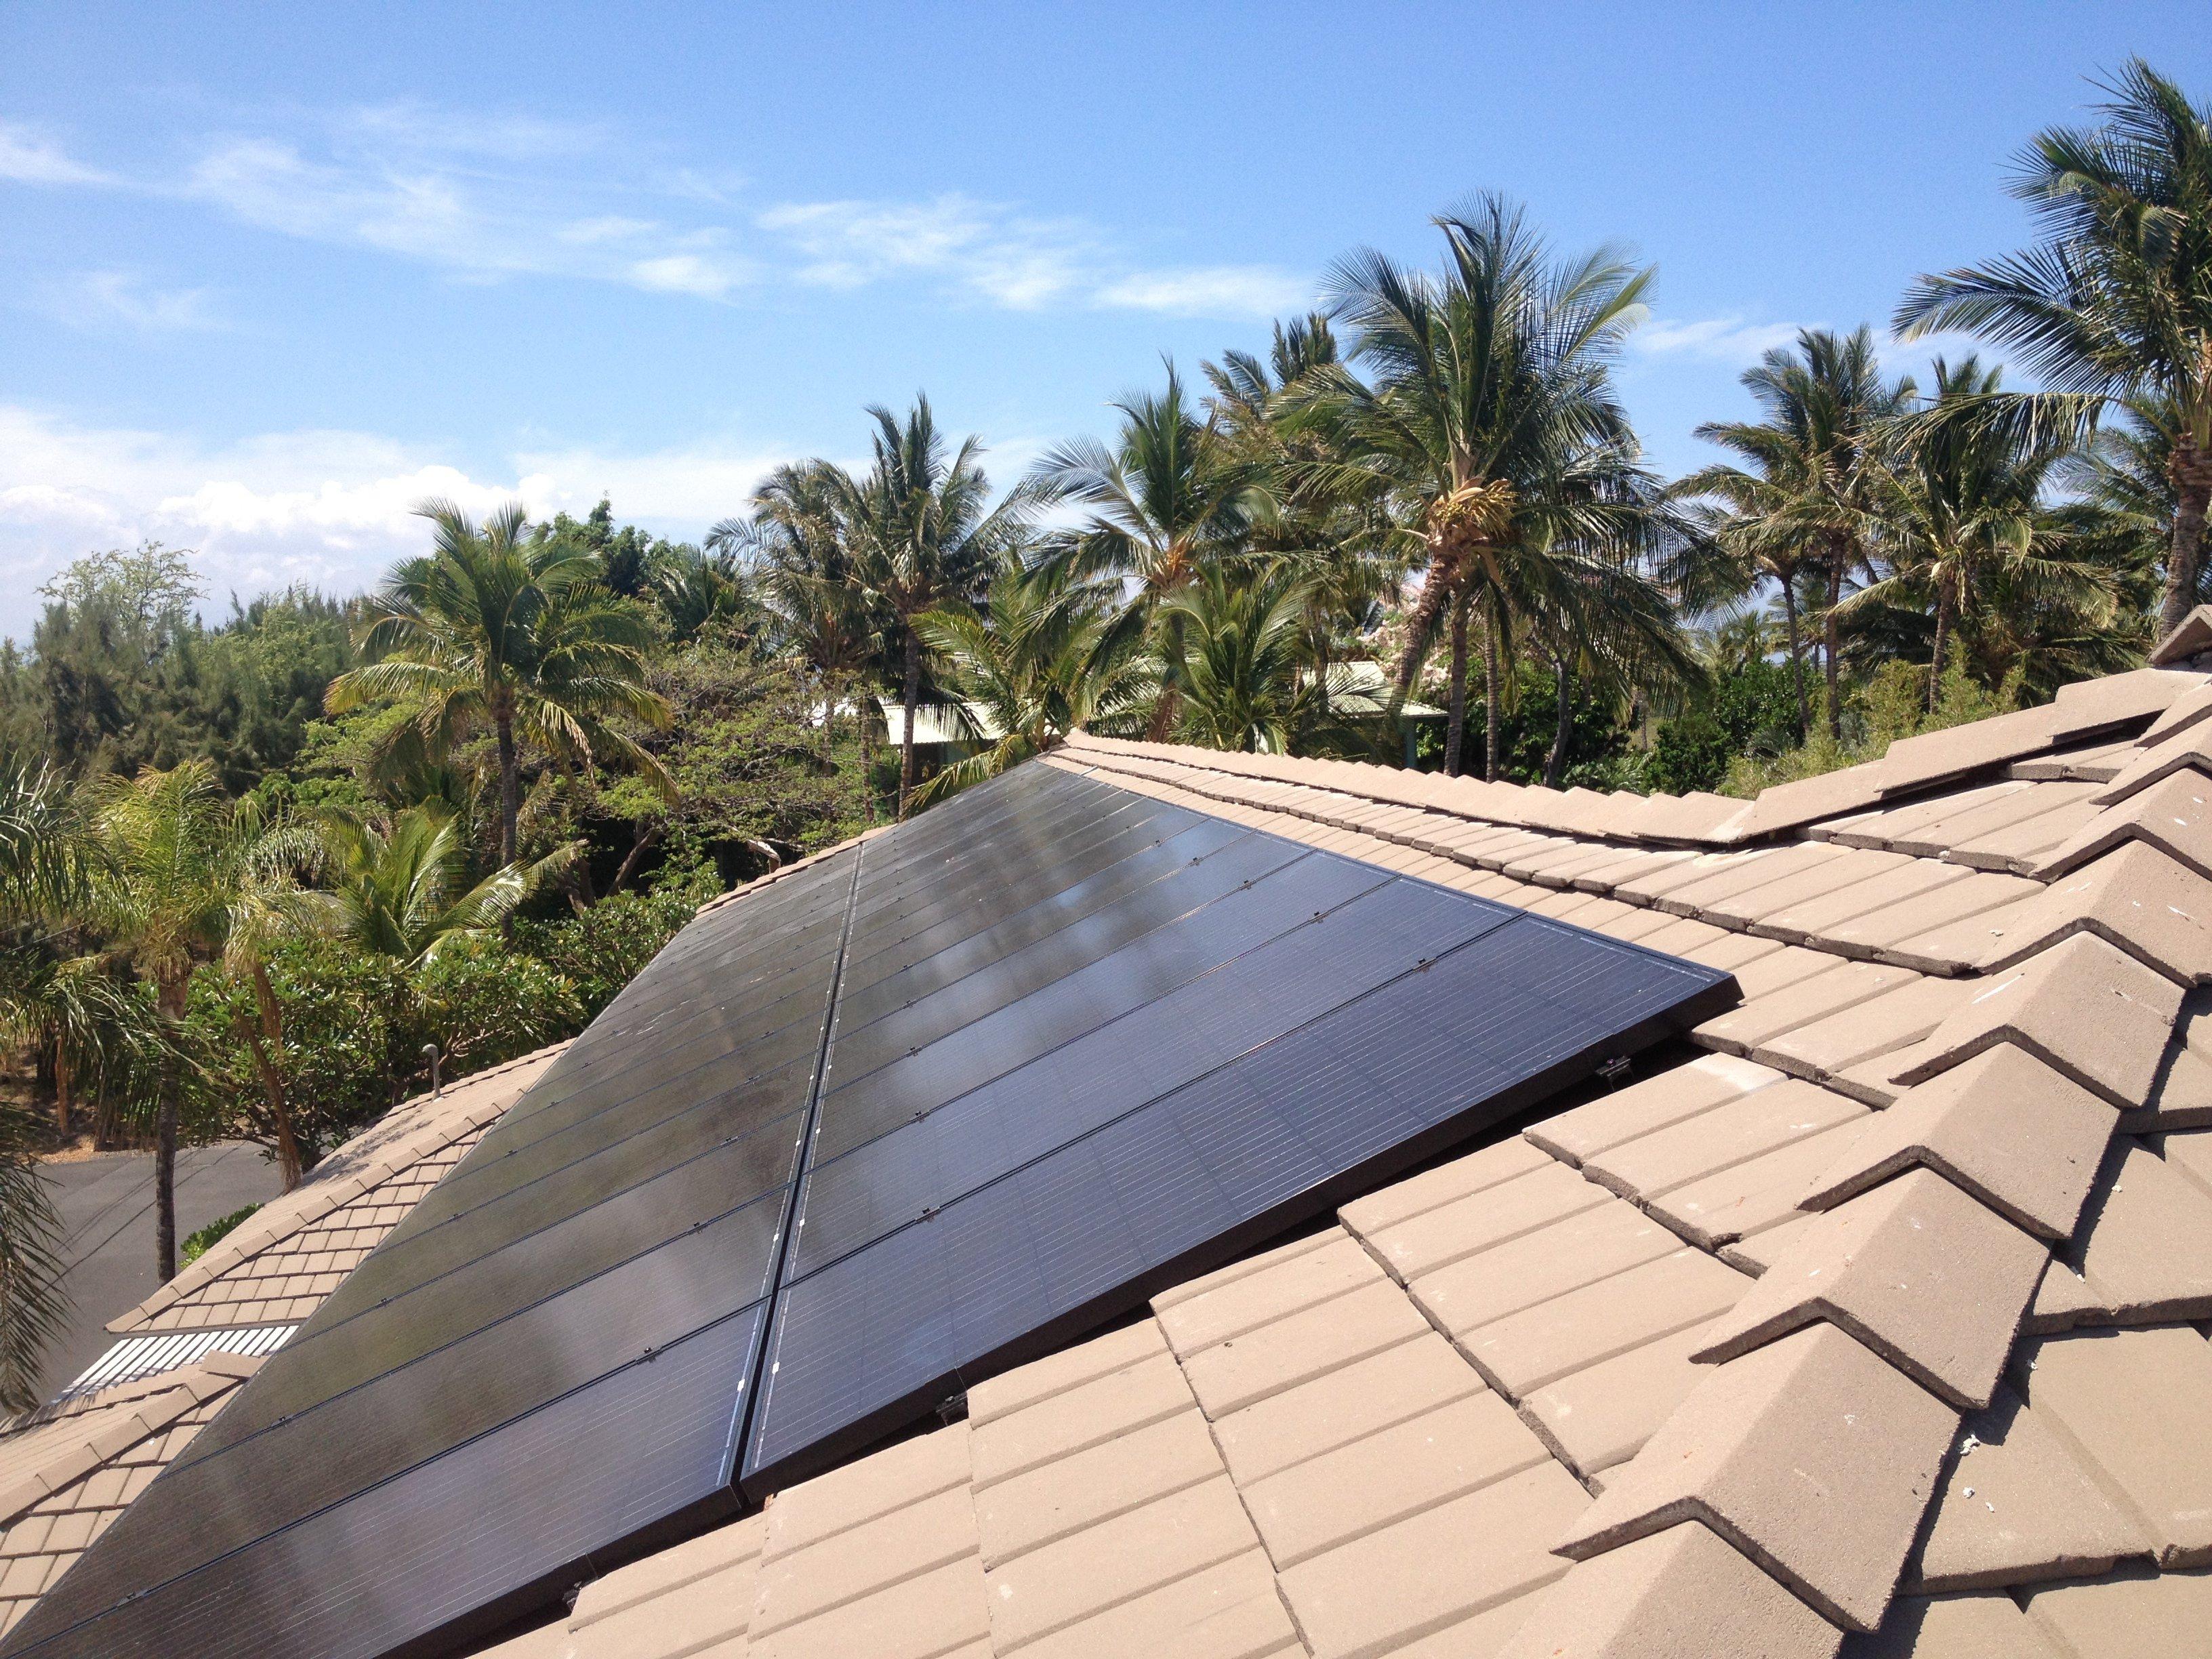 11.96 KW Solar PV system installed on rooftop in Honokaa, HI